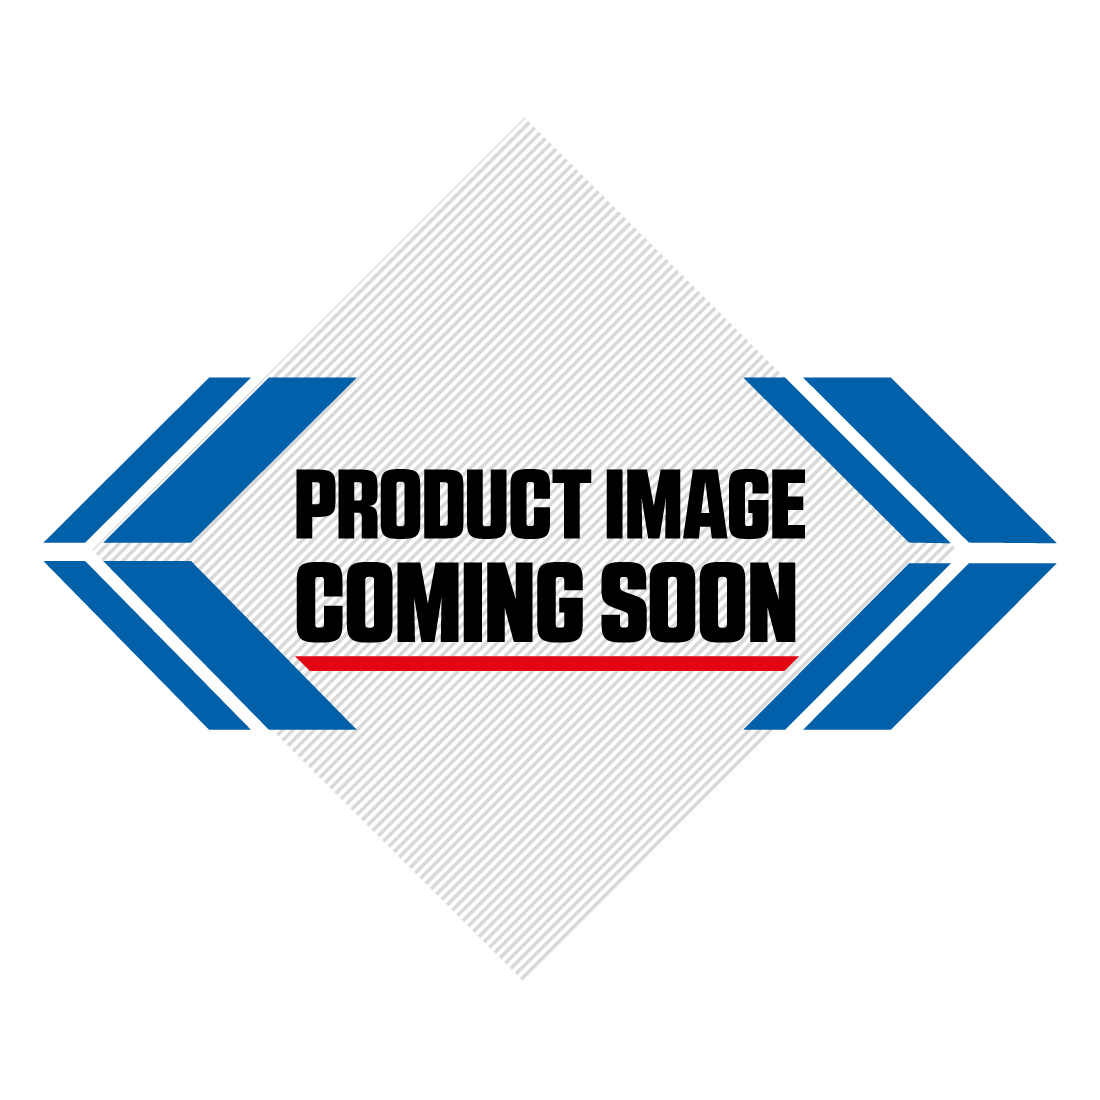 Suzuki Restyled Plastic Kit Suzuki RM 85 (00-17) Black Image-5>